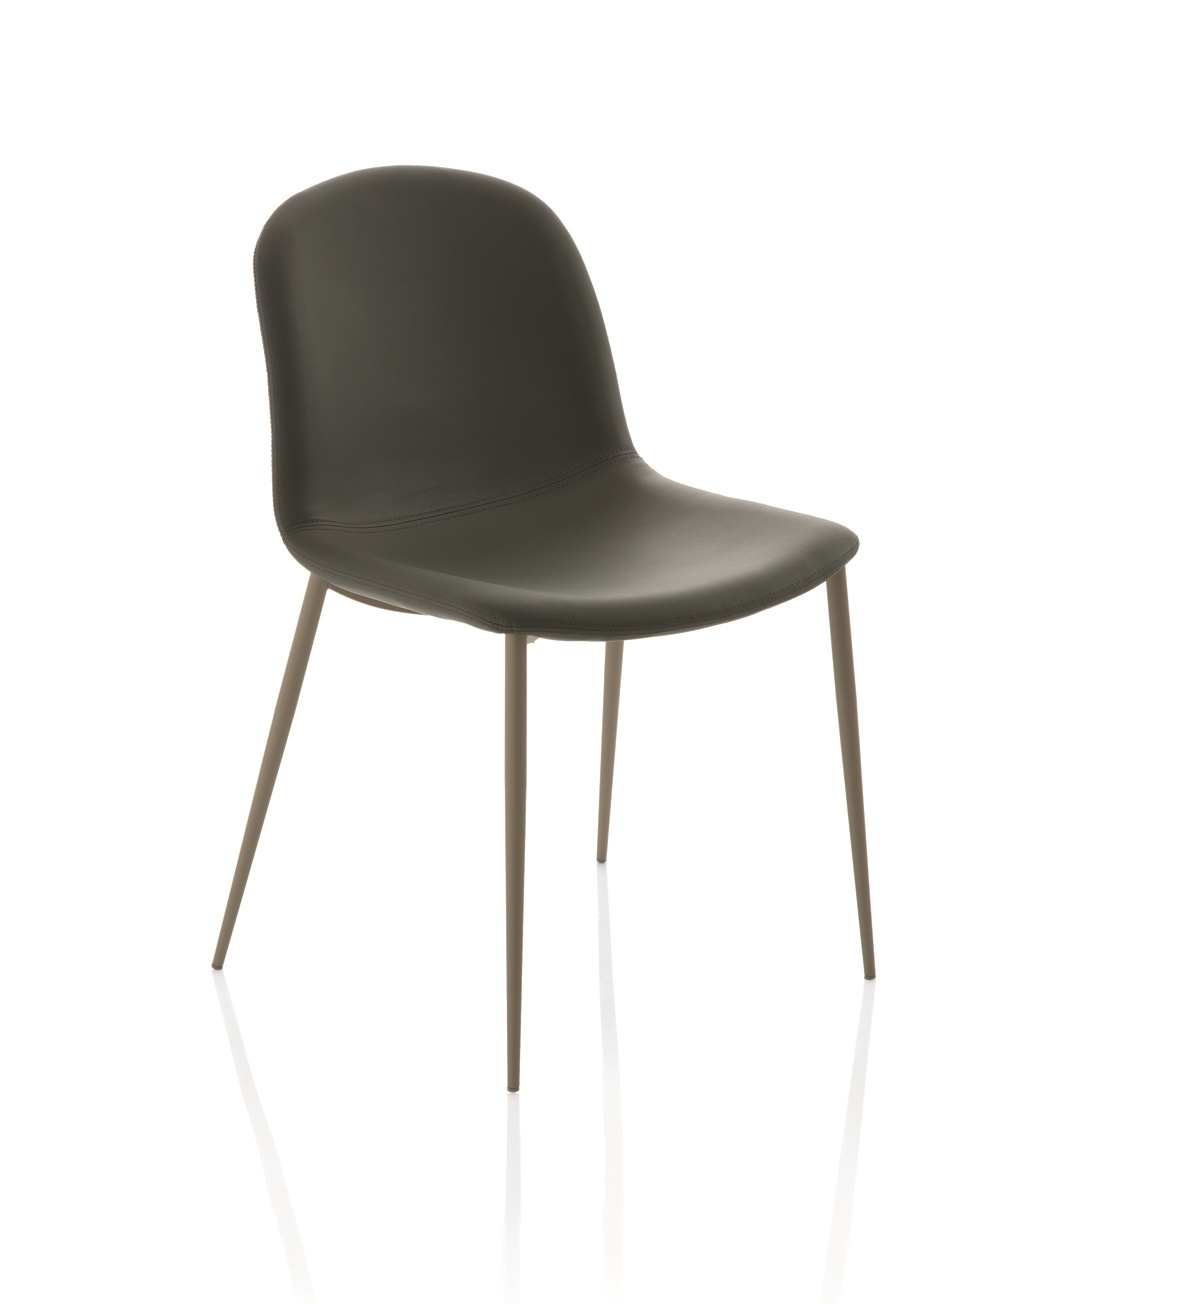 Seventy chair / Metal Legs, Bontempi CASA Dining Chairs